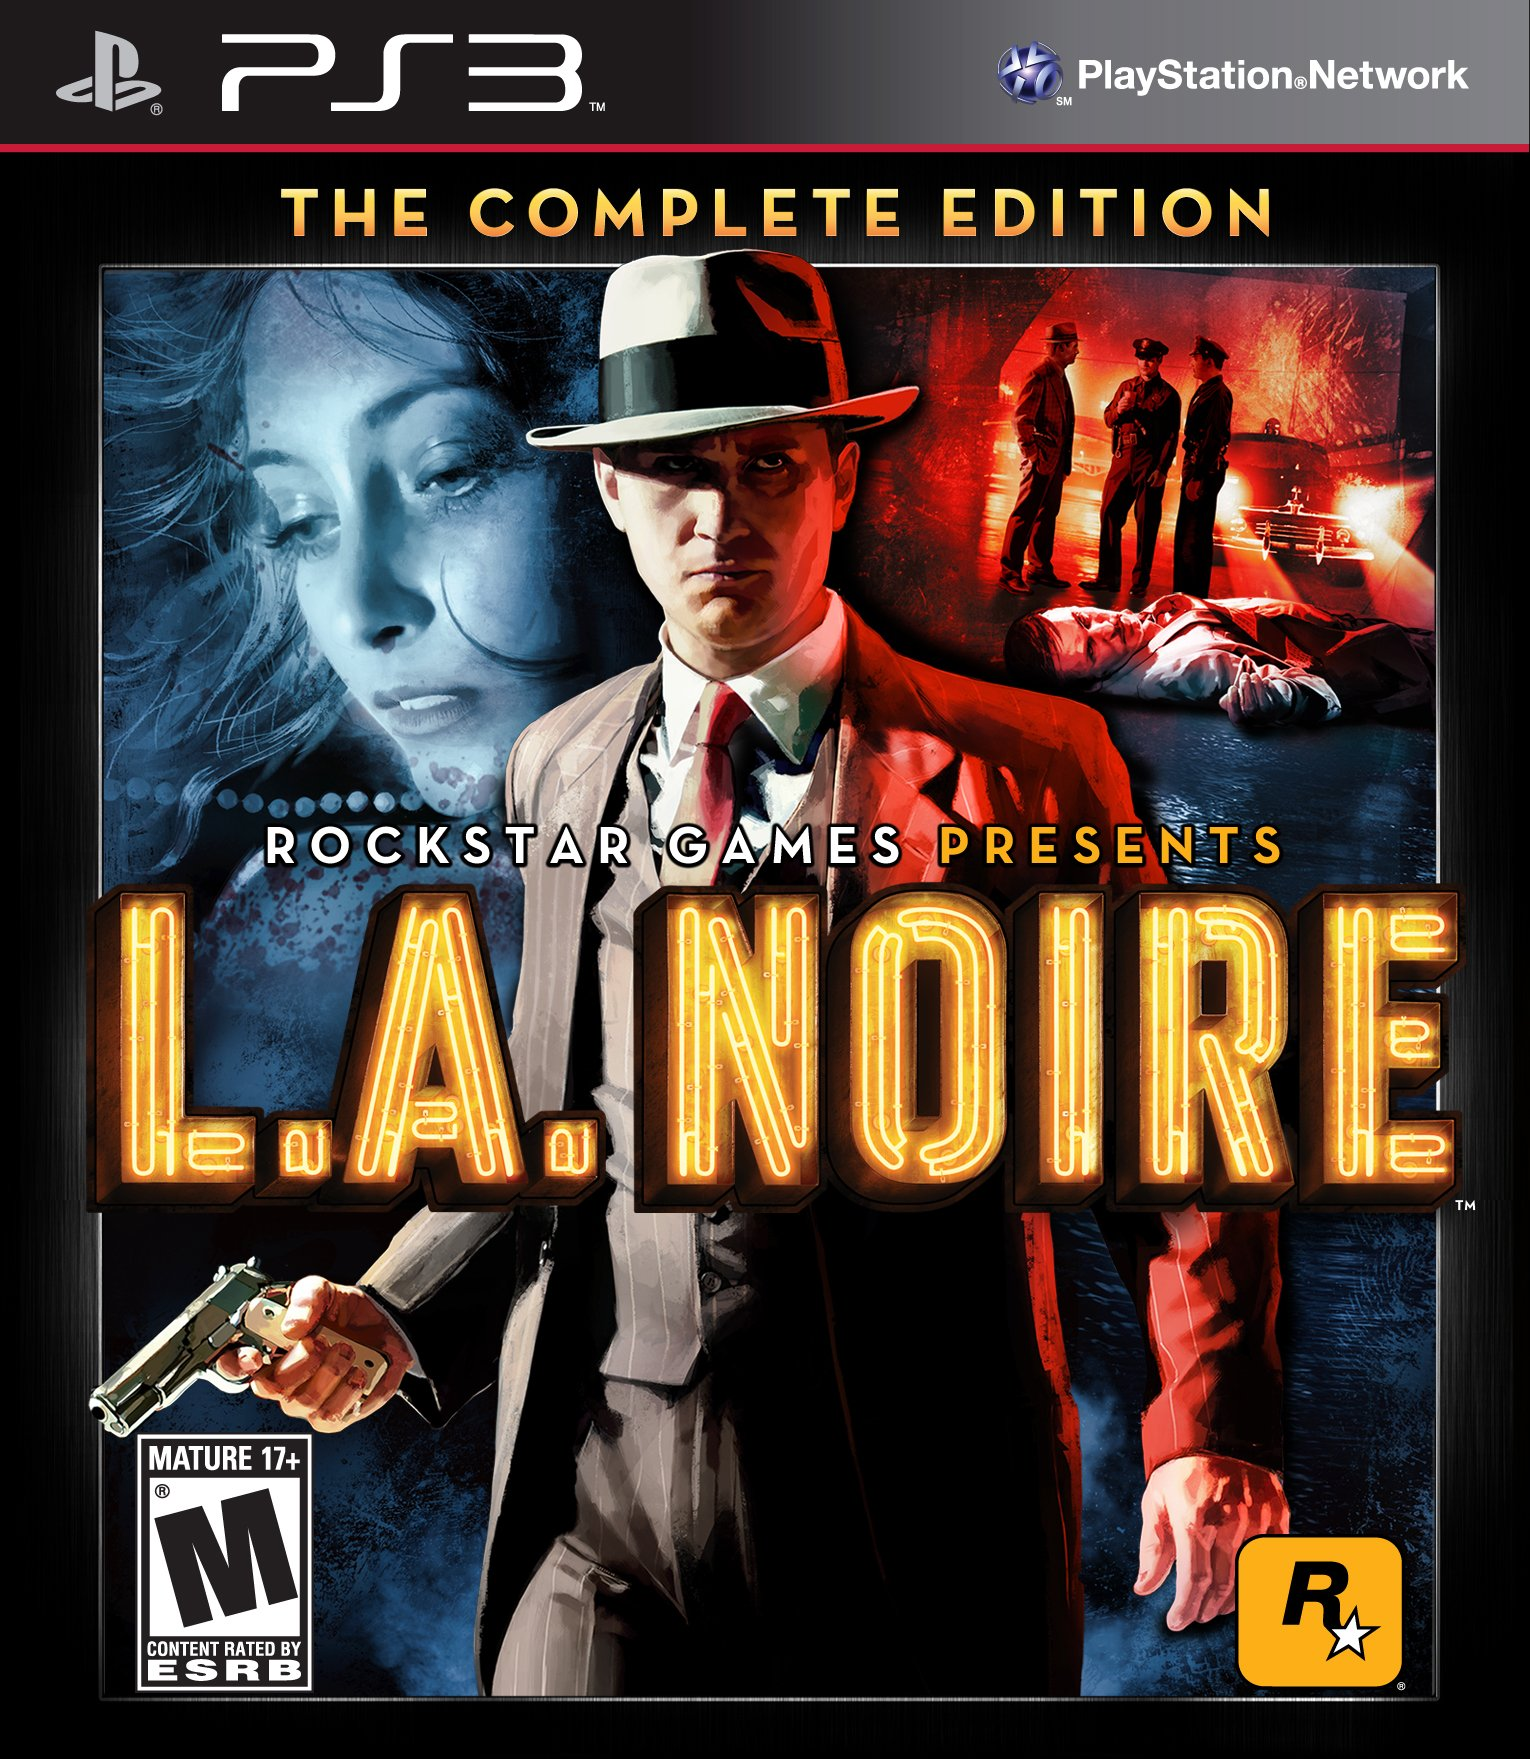 La noire 2 release date